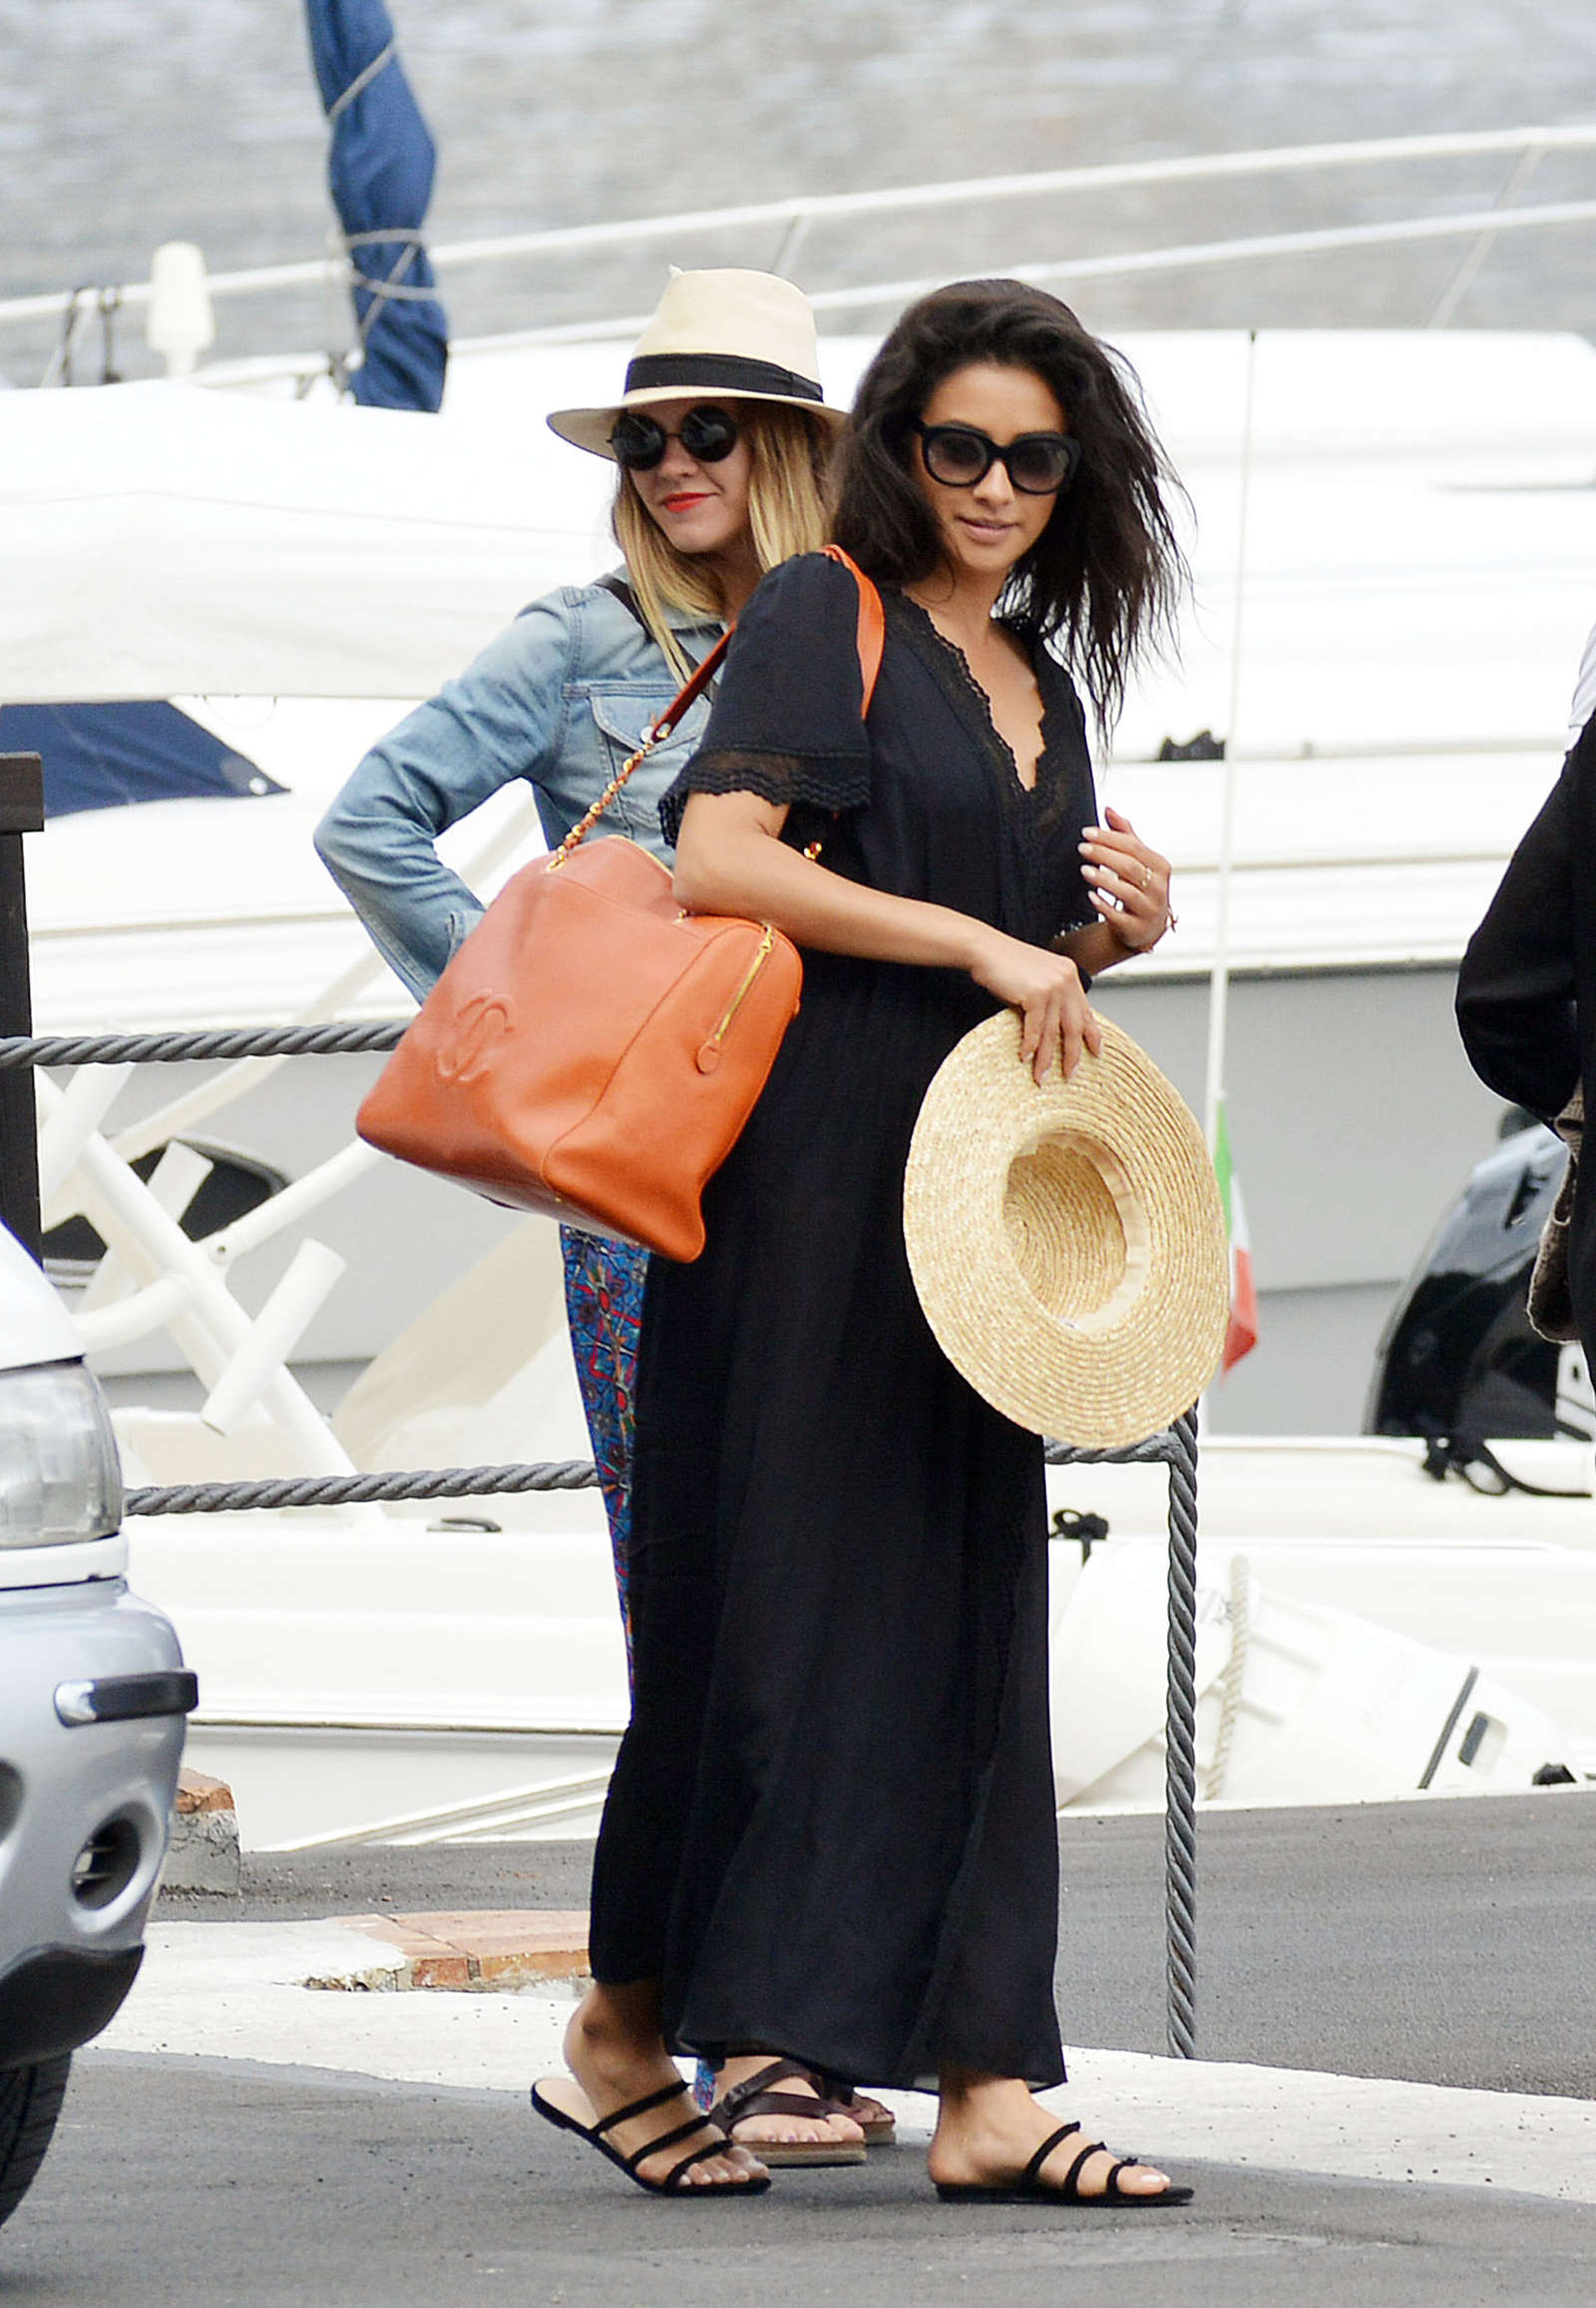 Ashley Benson 2016 : Ashley Benson, Shay Mitchell and Troian Bellisario on a boat in Capri -56